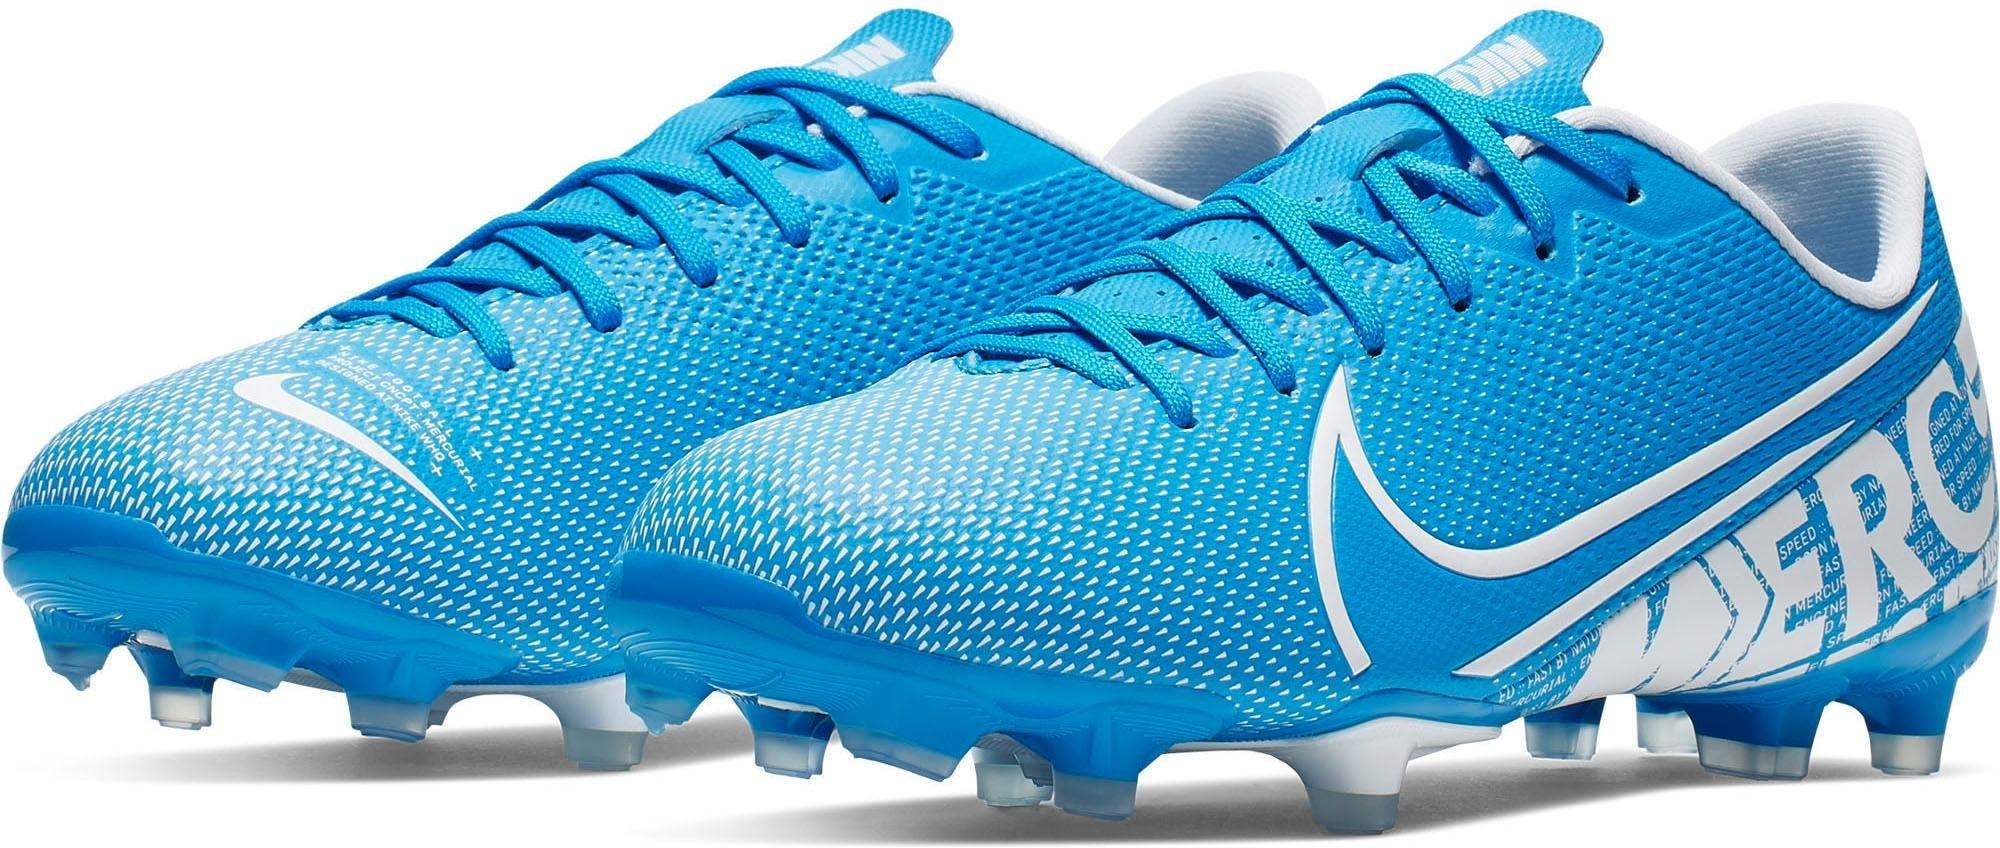 Nike voetbalschoenen »Jr Mercurial Vapor 13 Academy Fg/mg« nu online bestellen